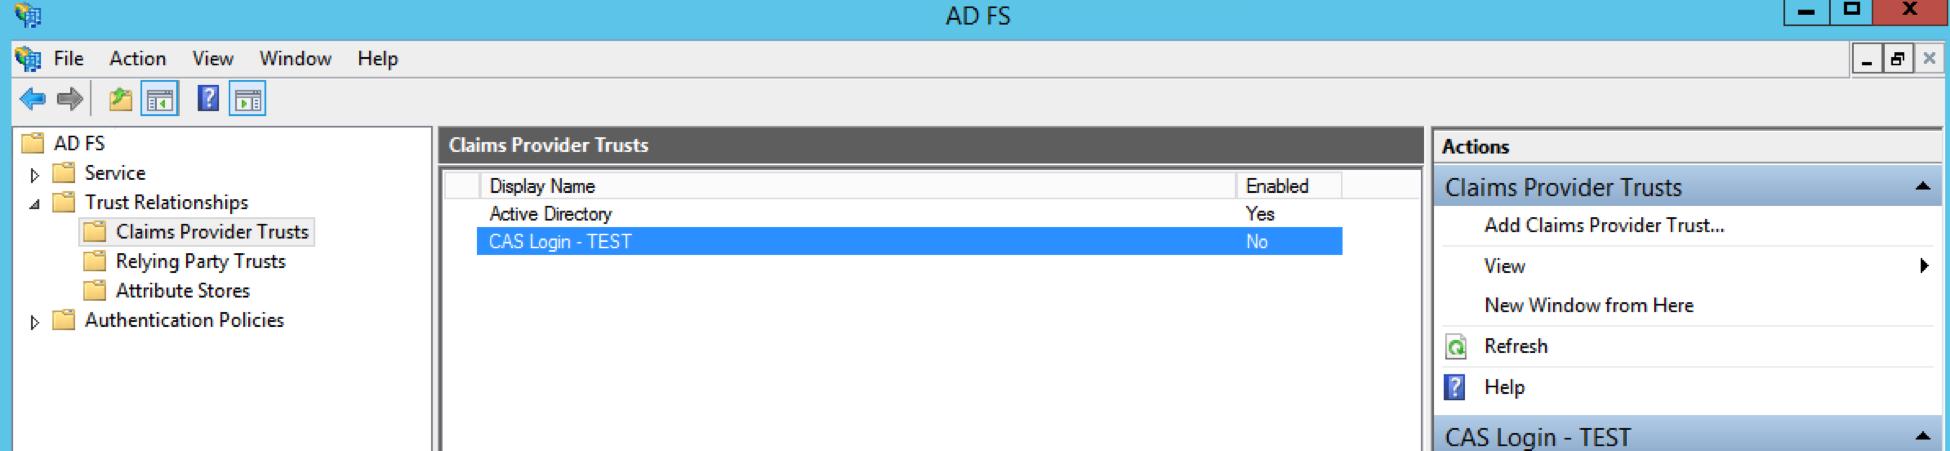 Apereo CAS SAML Integration With ADFS – Apereo Community Blog